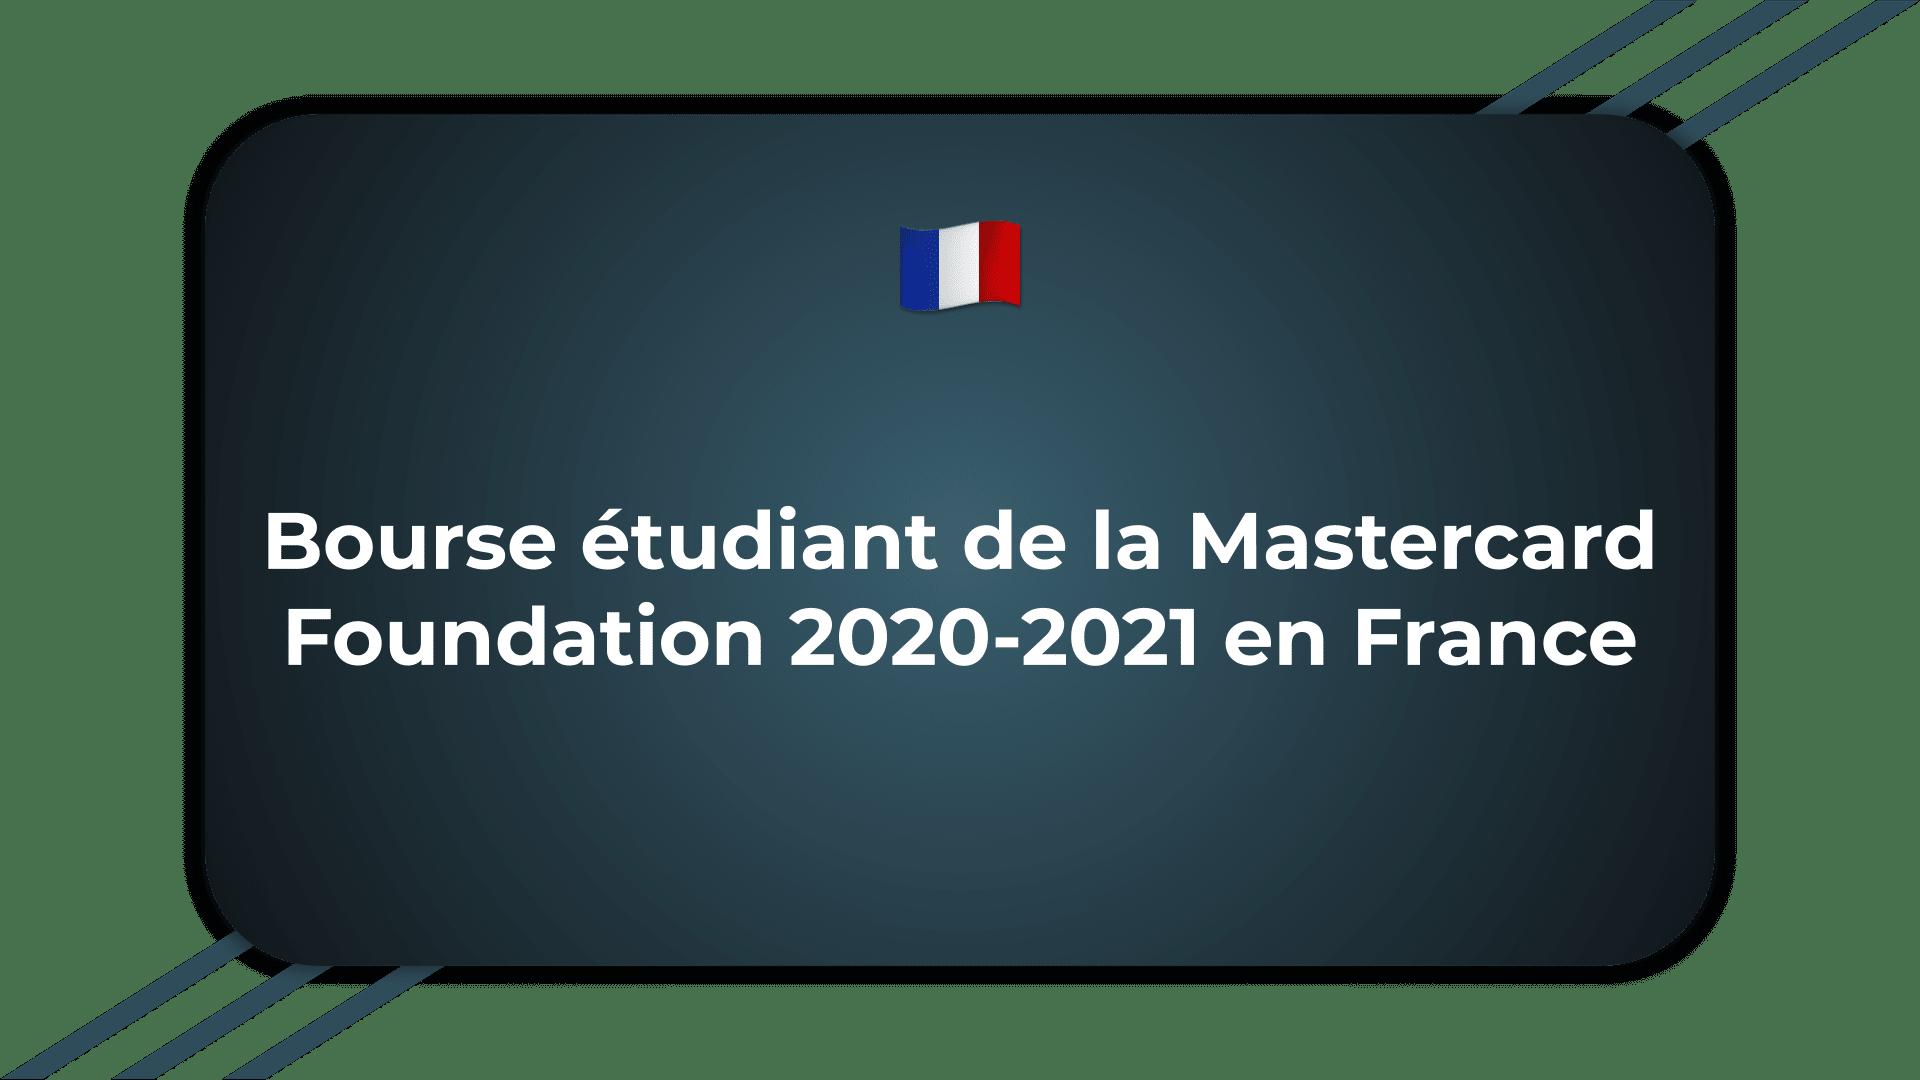 Bourse Mastercard Foundation